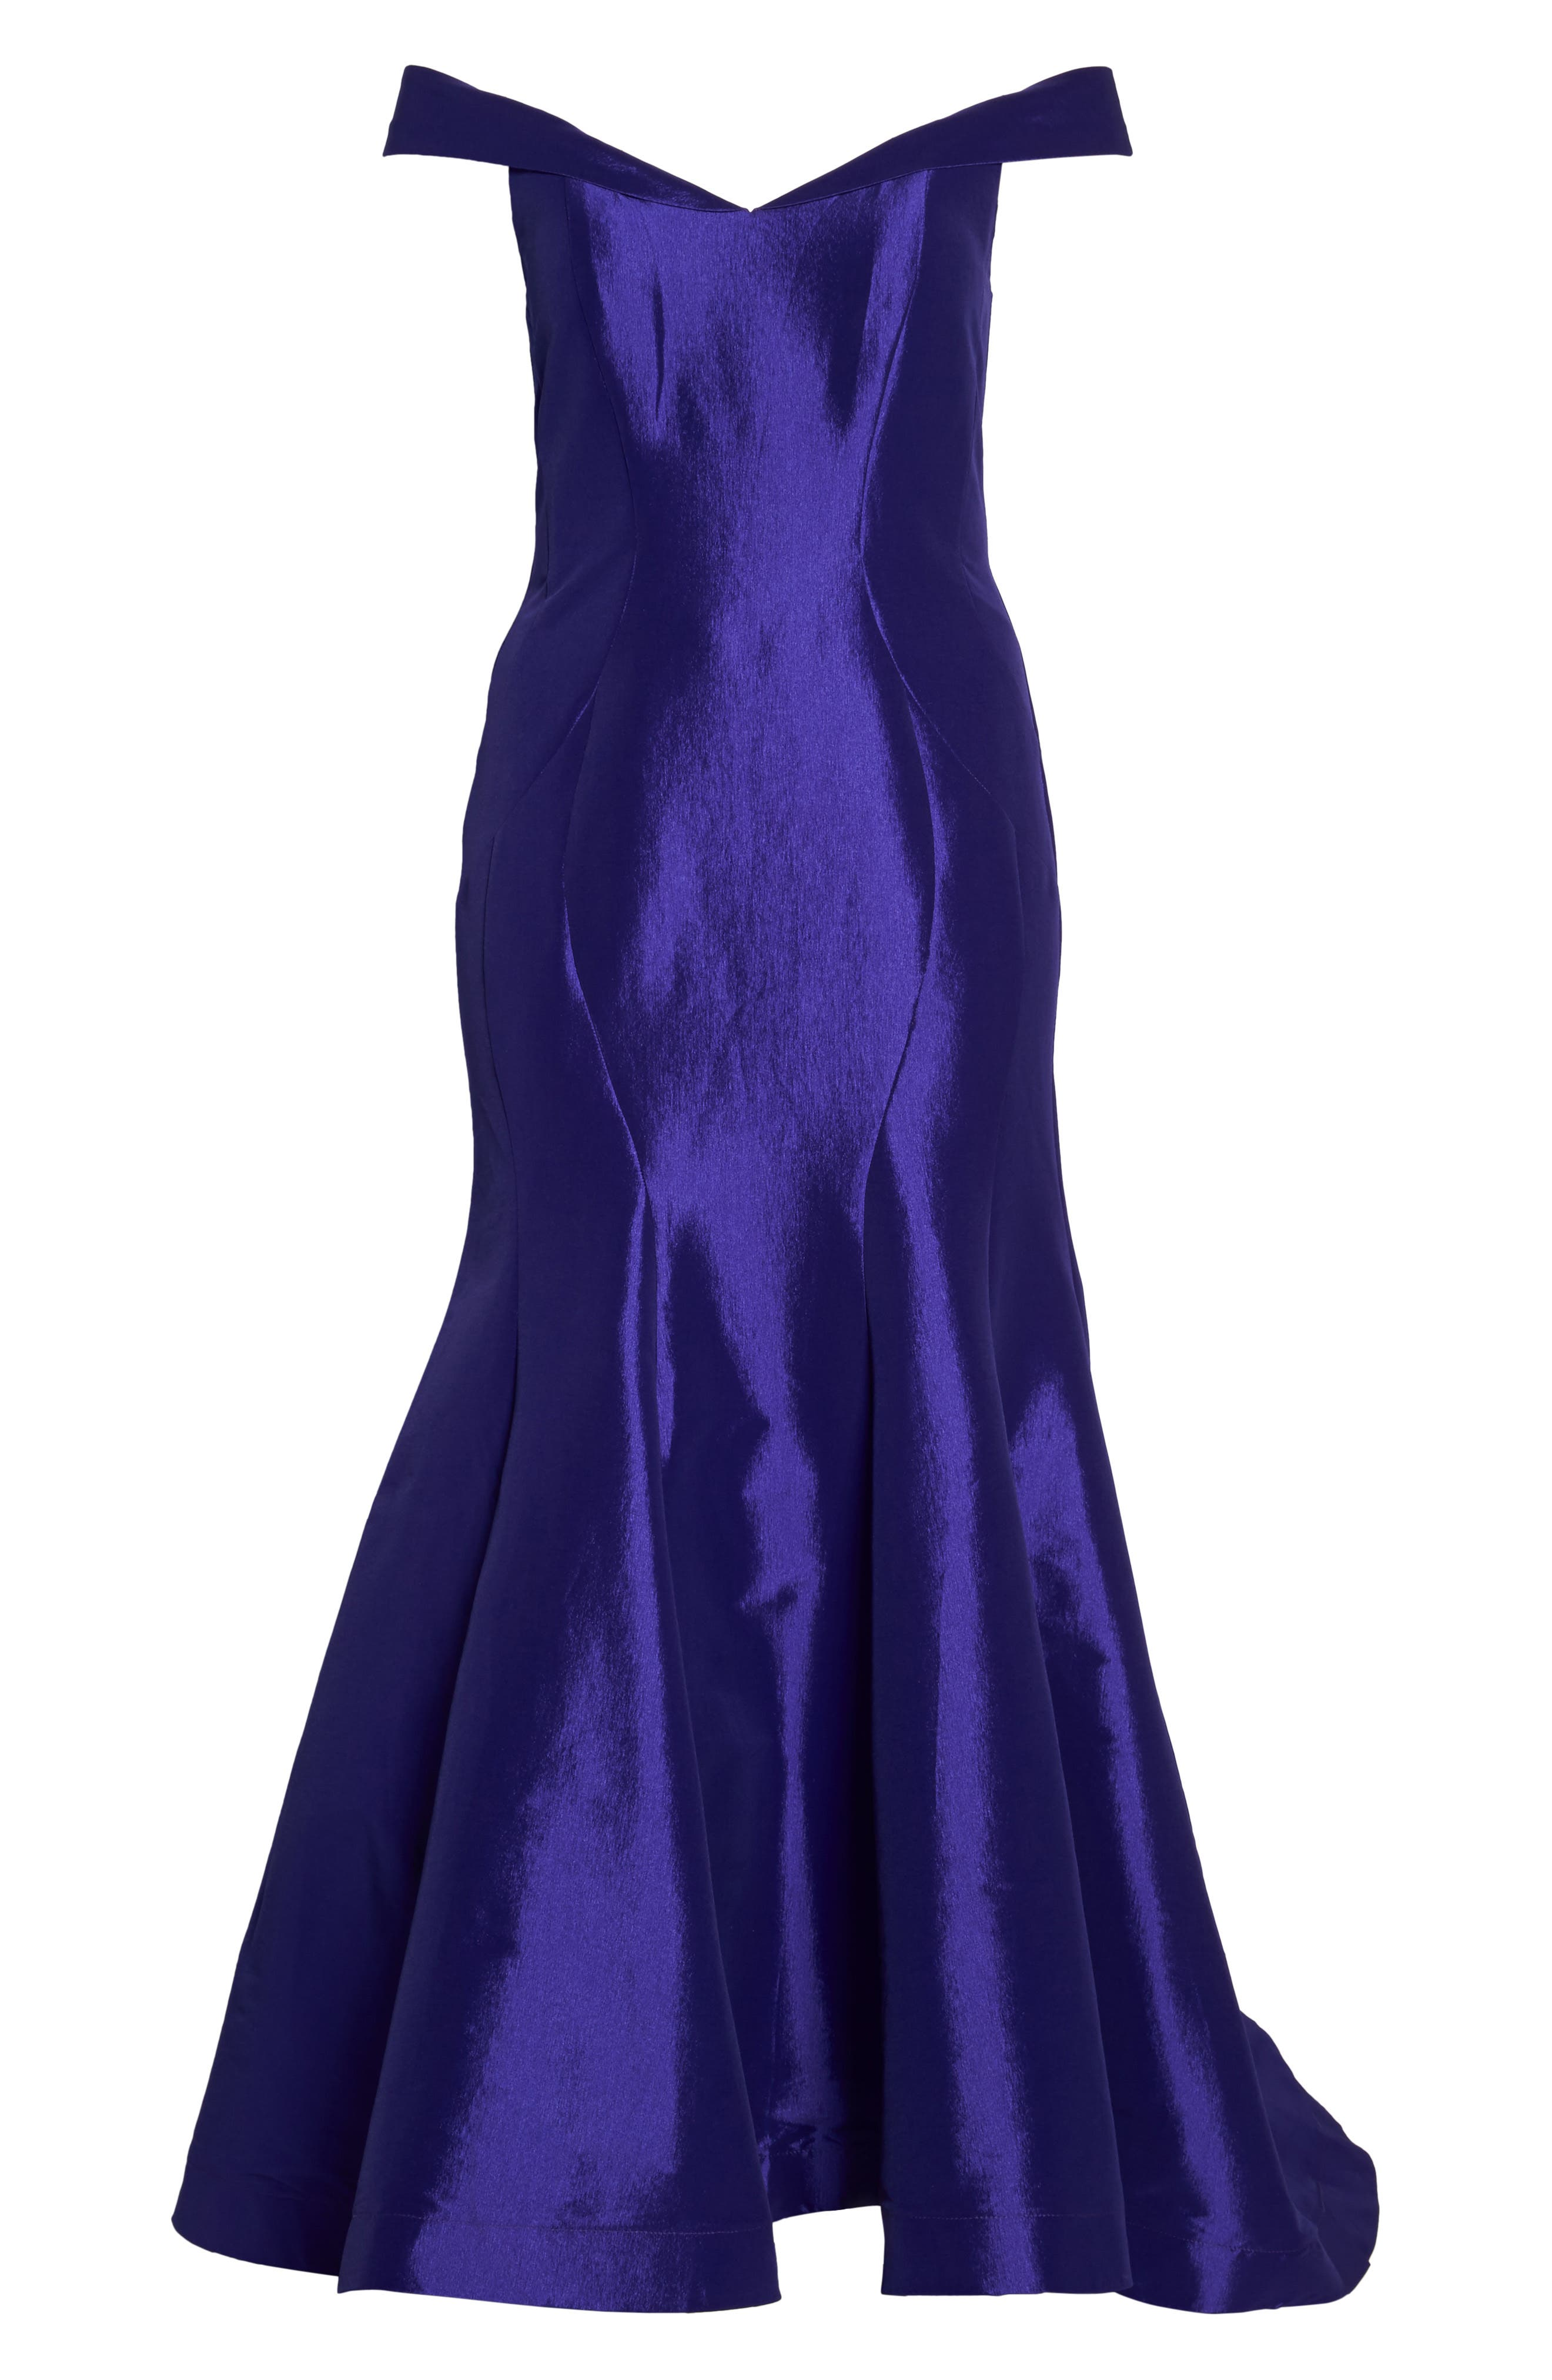 Off the Shoulder Mermaid Gown,                             Alternate thumbnail 6, color,                             ROYAL/ PURPLE